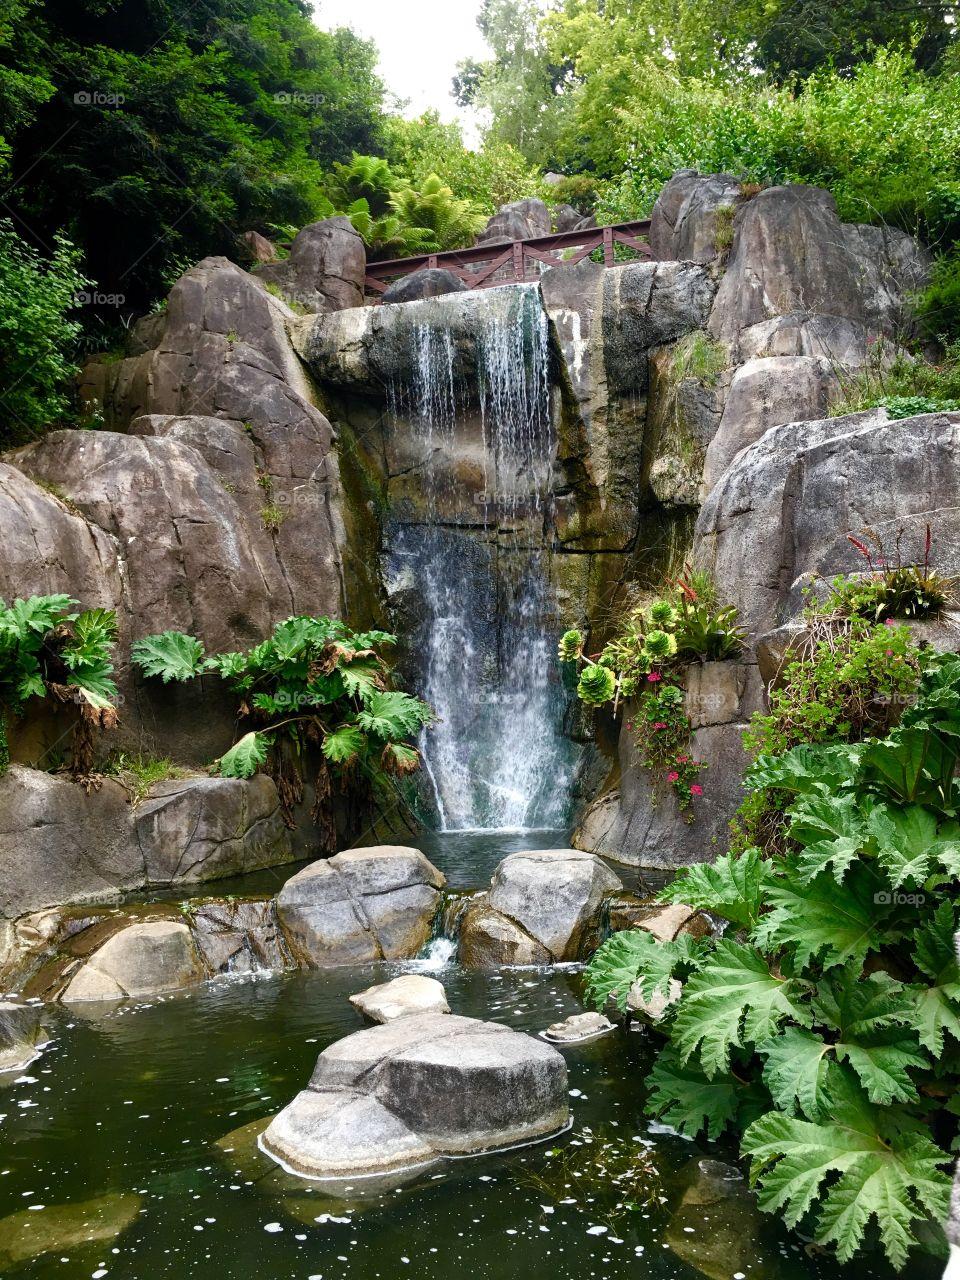 Waterfall in Golden Gate Park